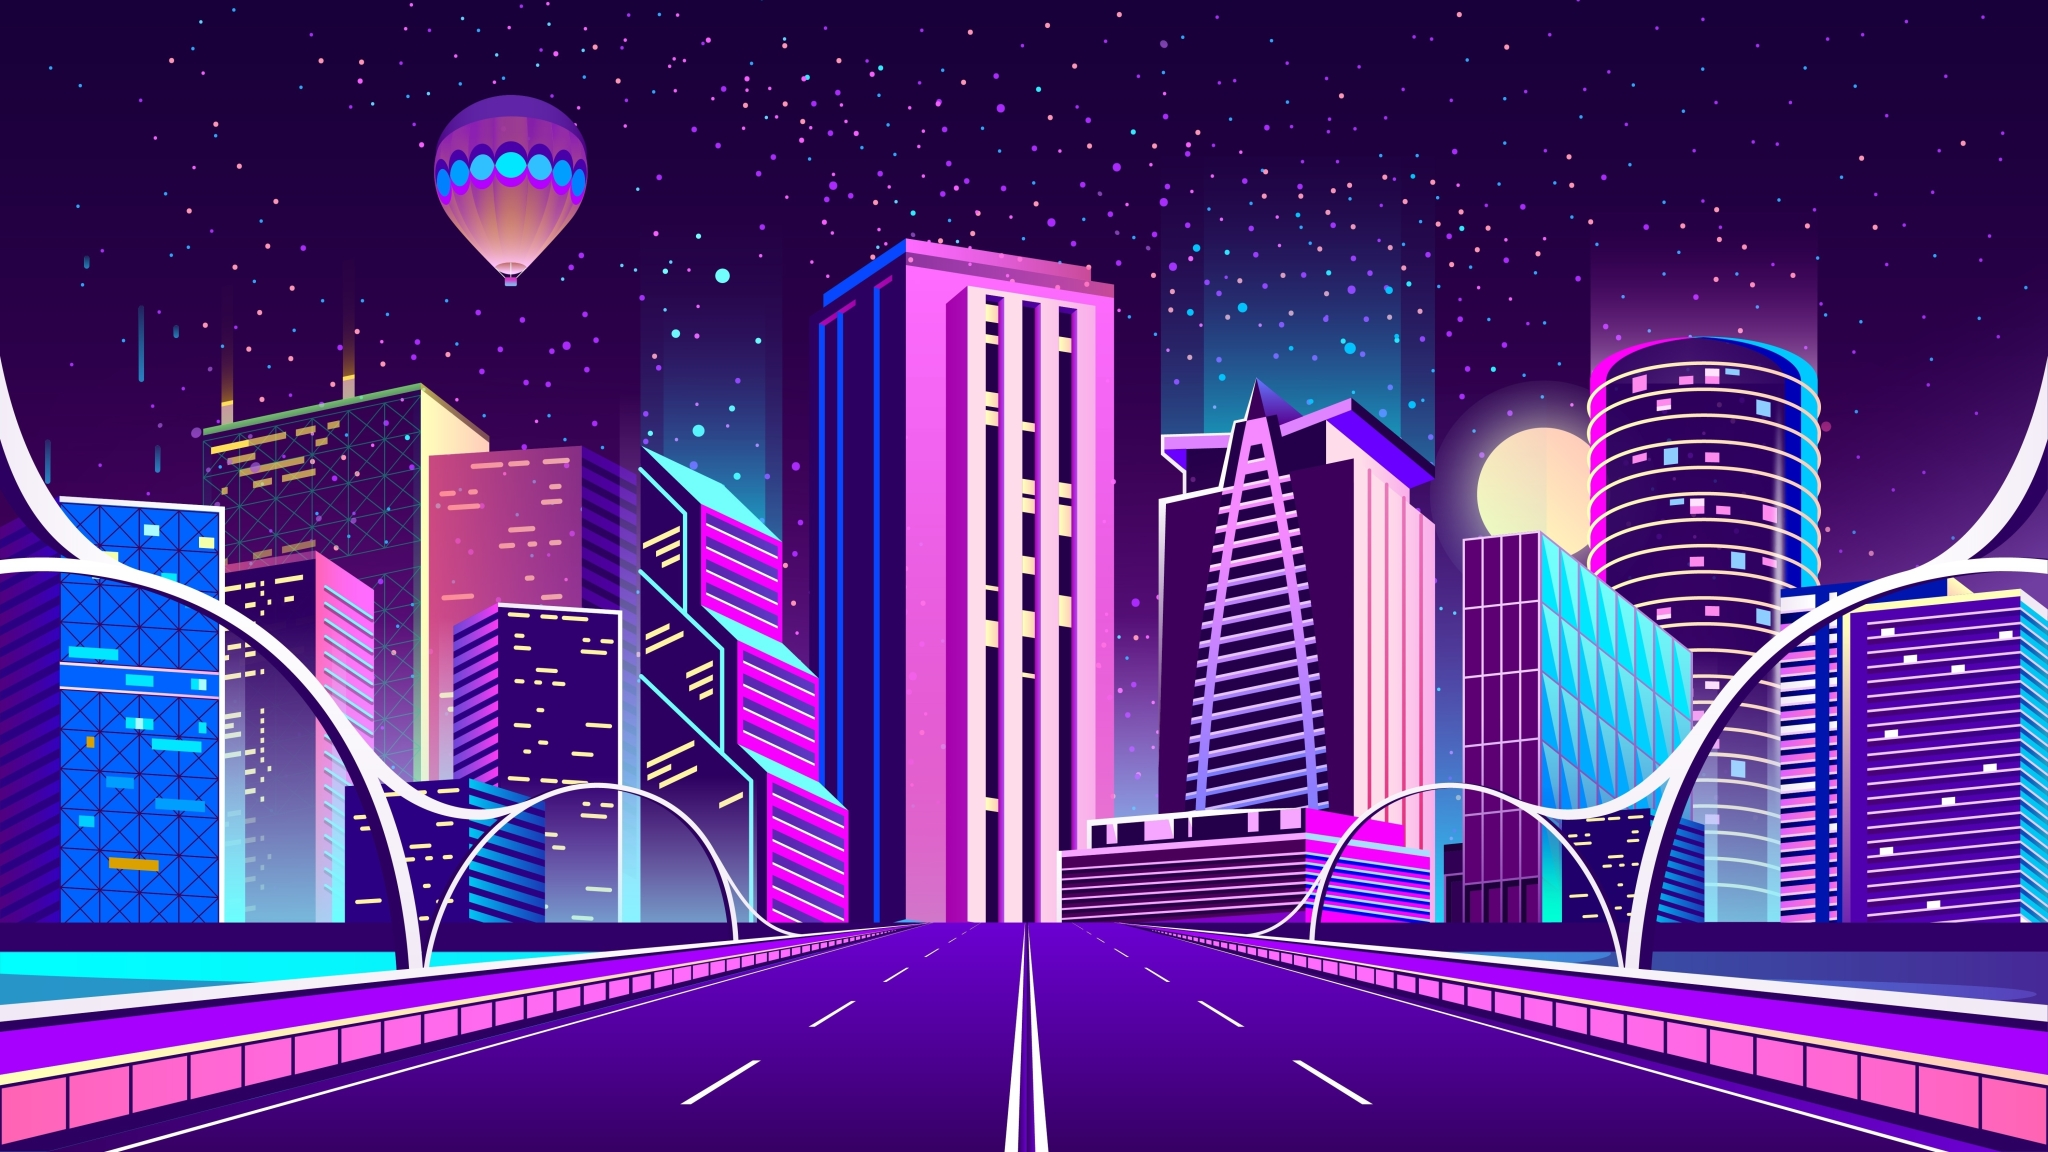 2048x1152 Digital City Road 2048x1152 Resolution Wallpaper